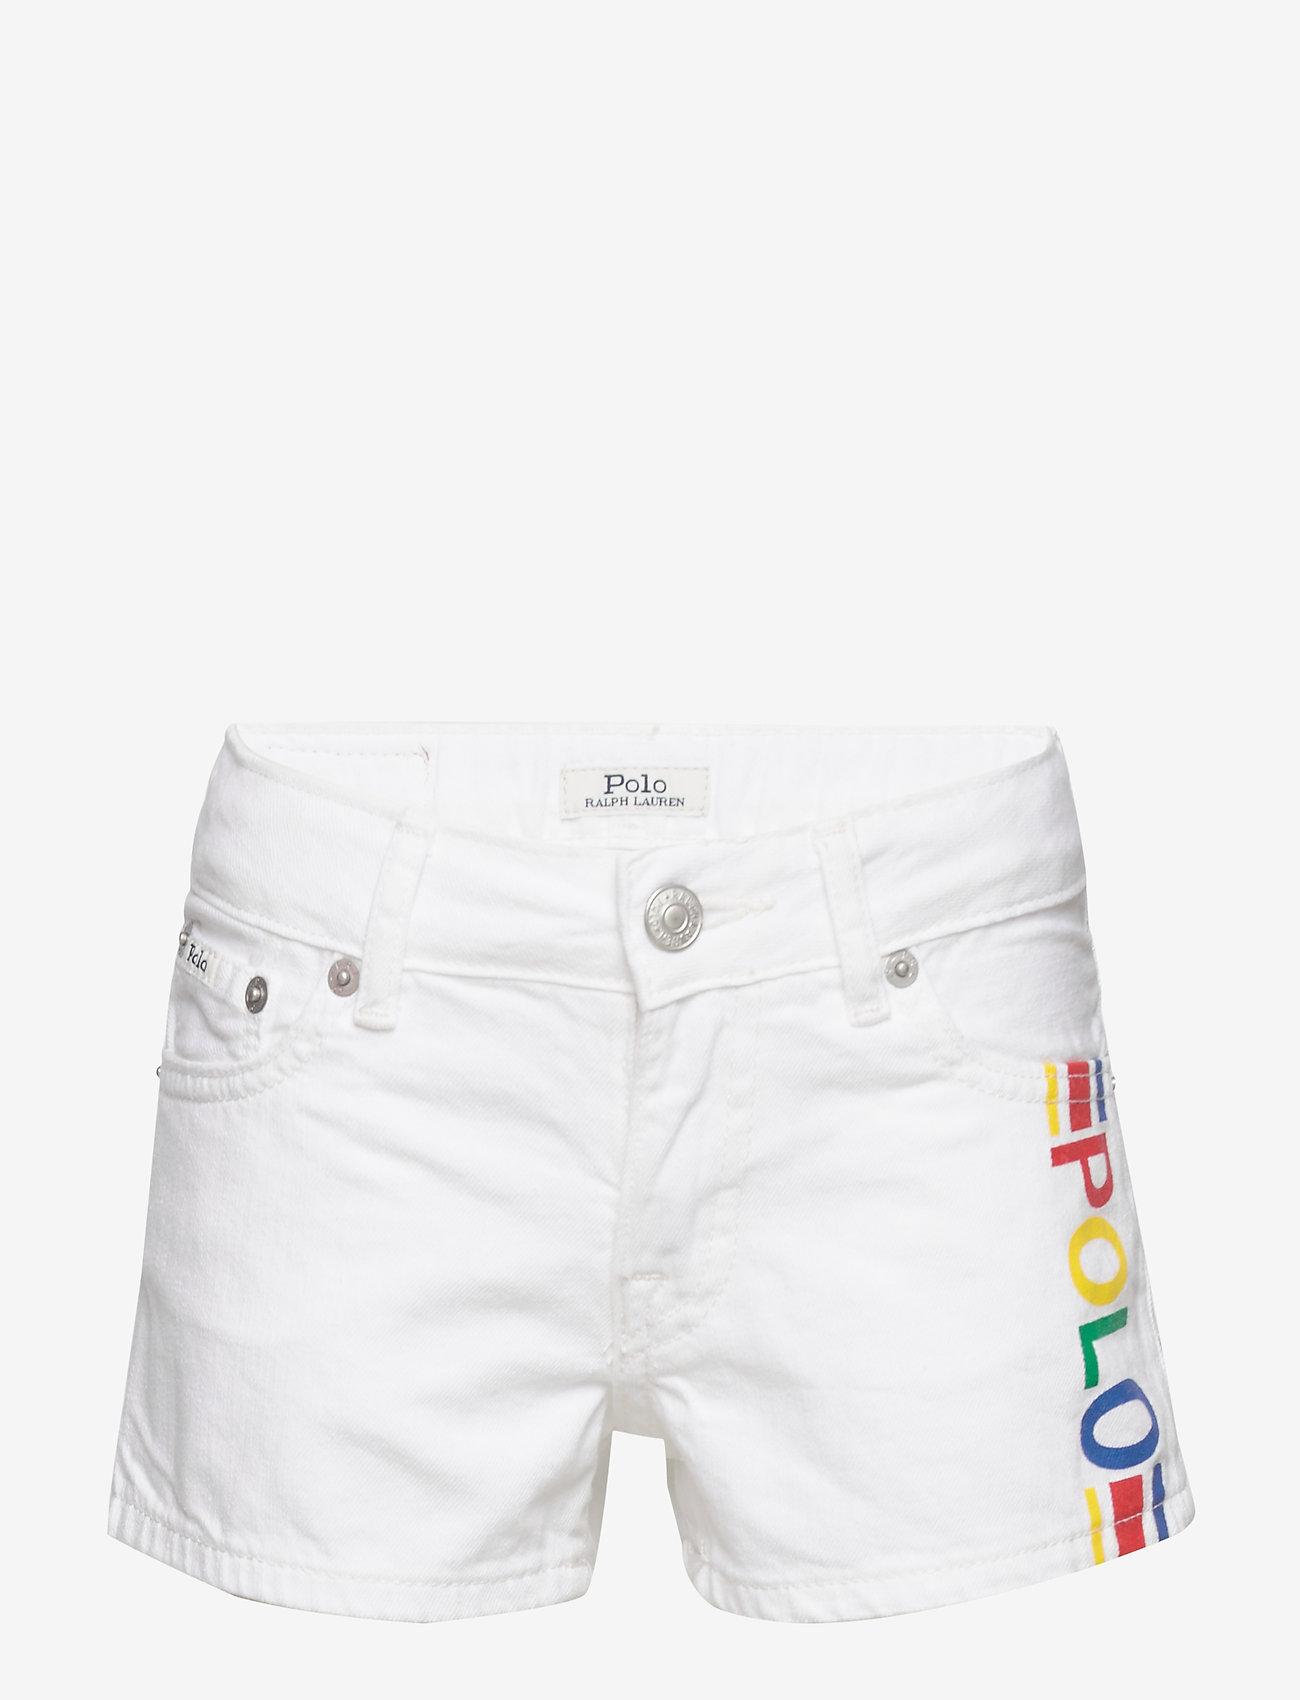 Ralph Lauren Kids - Polo Cotton Denim Short - shorts - myra wash